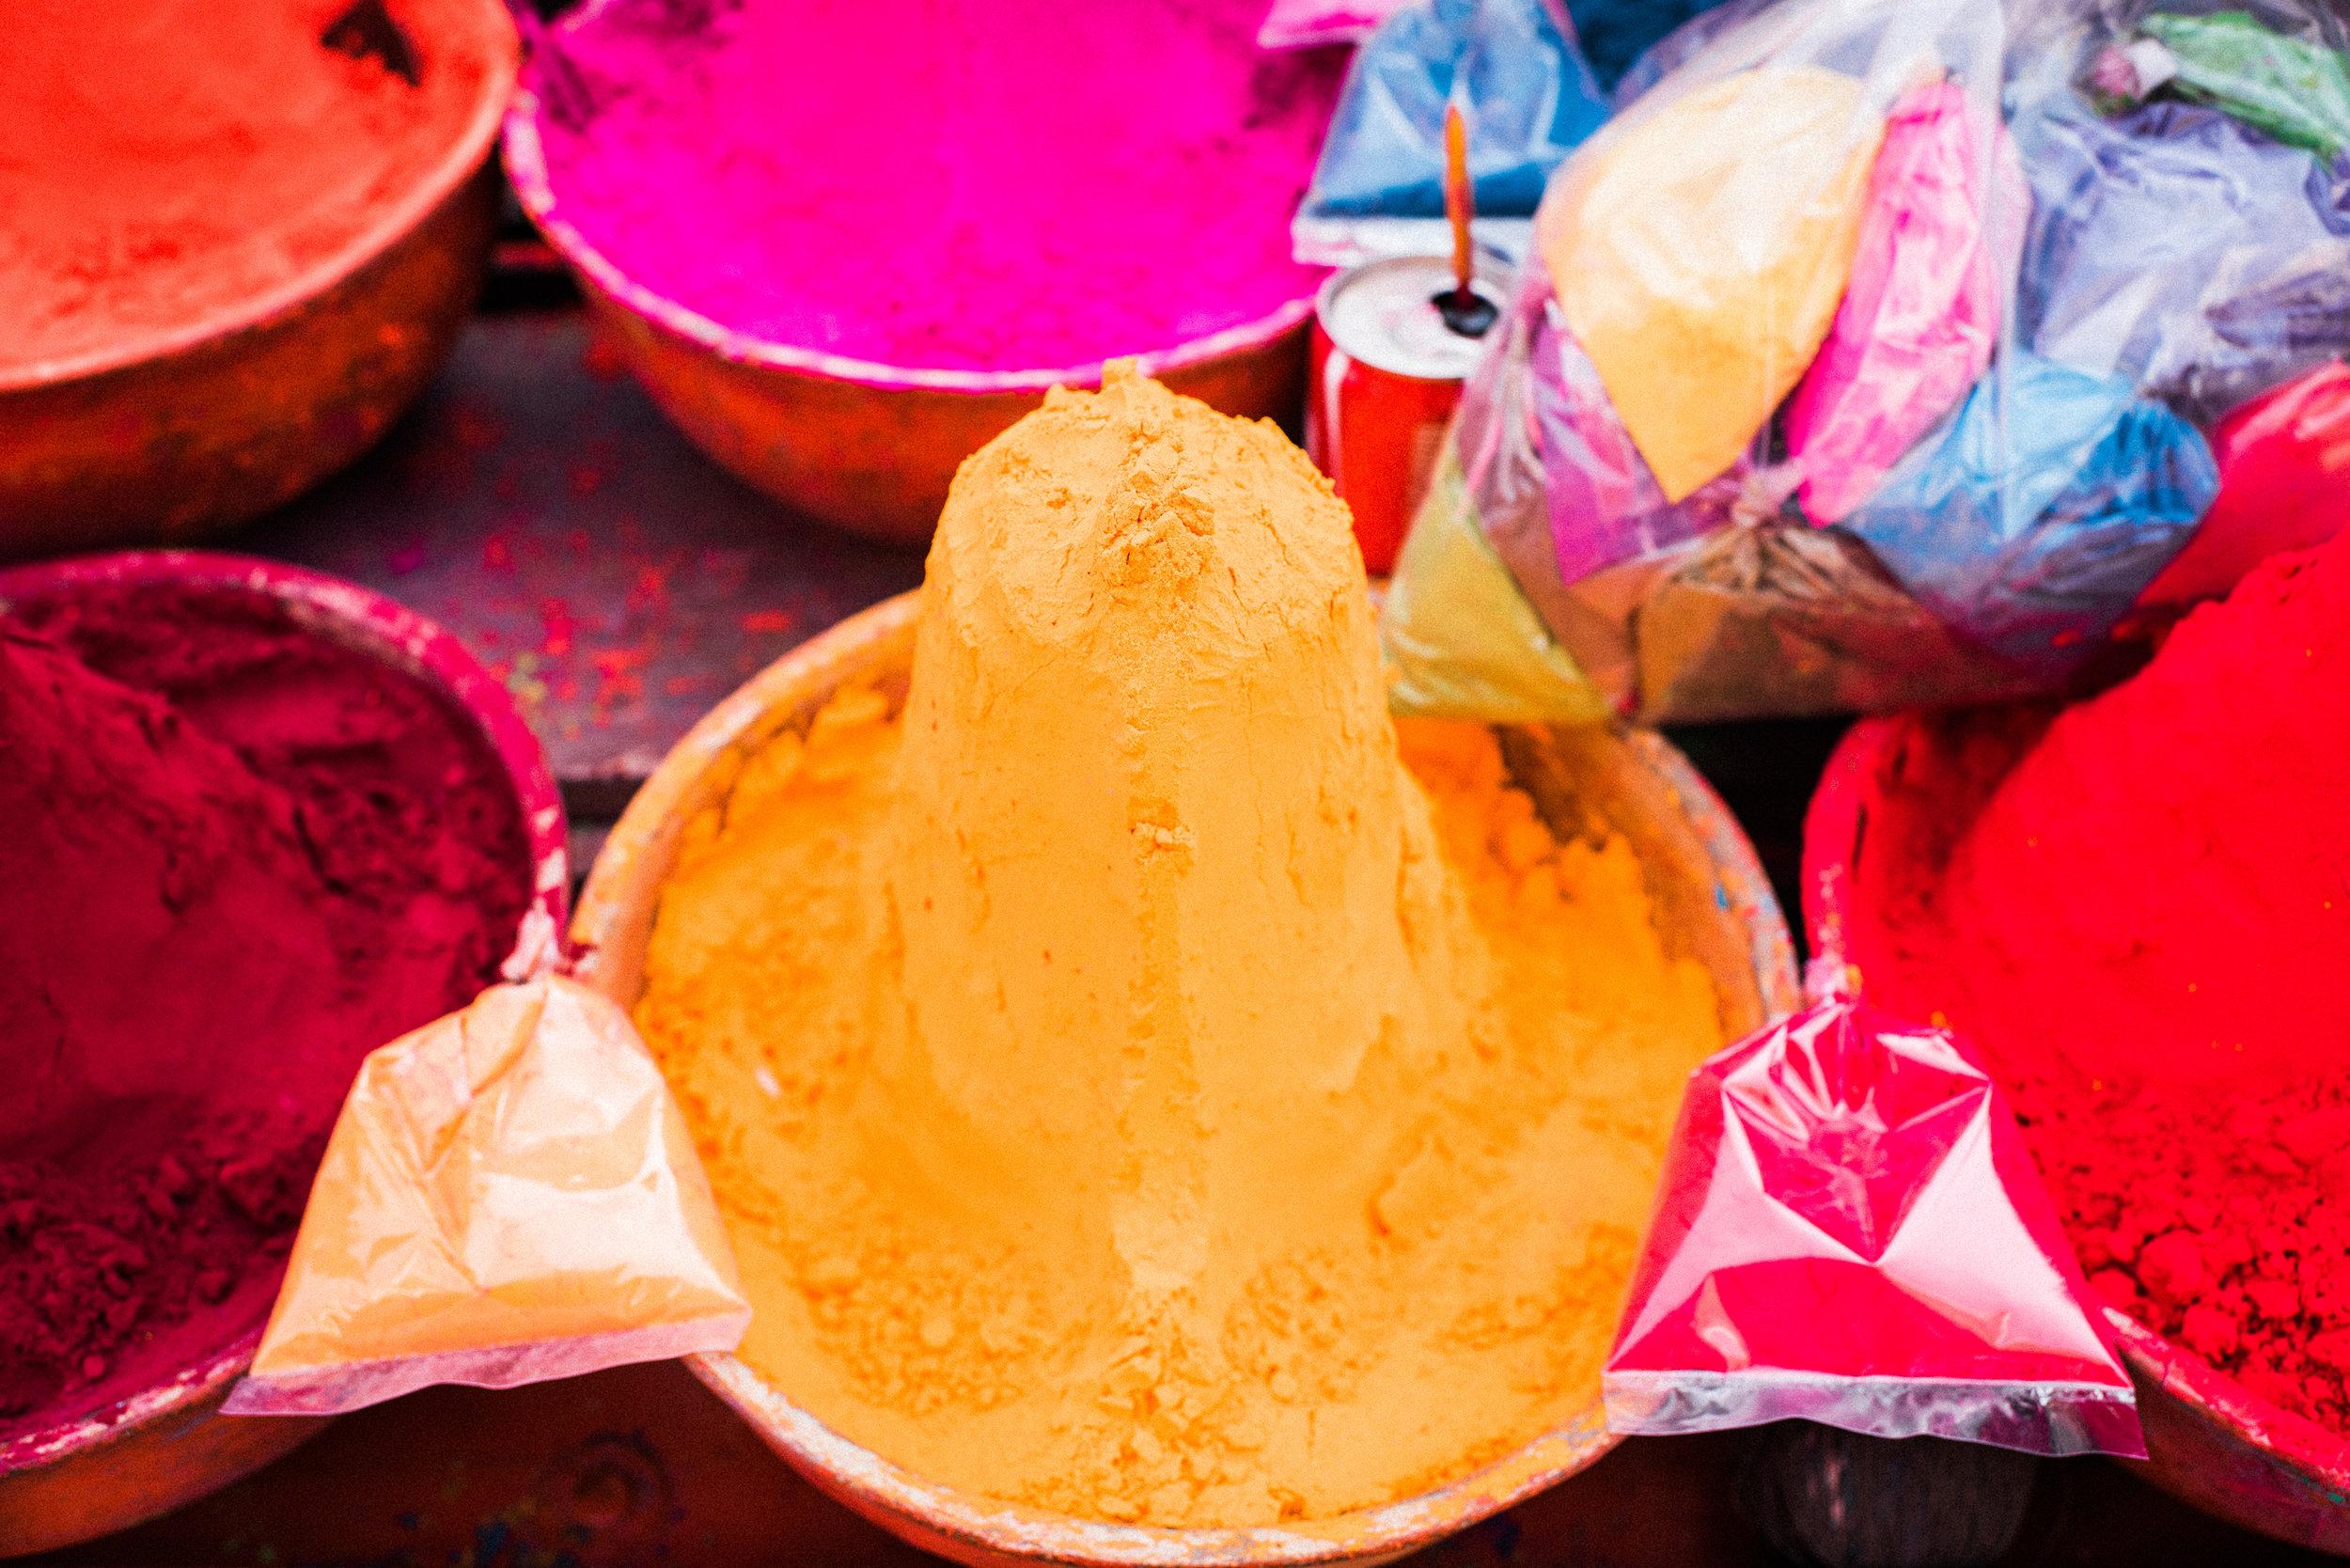 Pushkar_India_TaraShupe_Photography_020.jpg